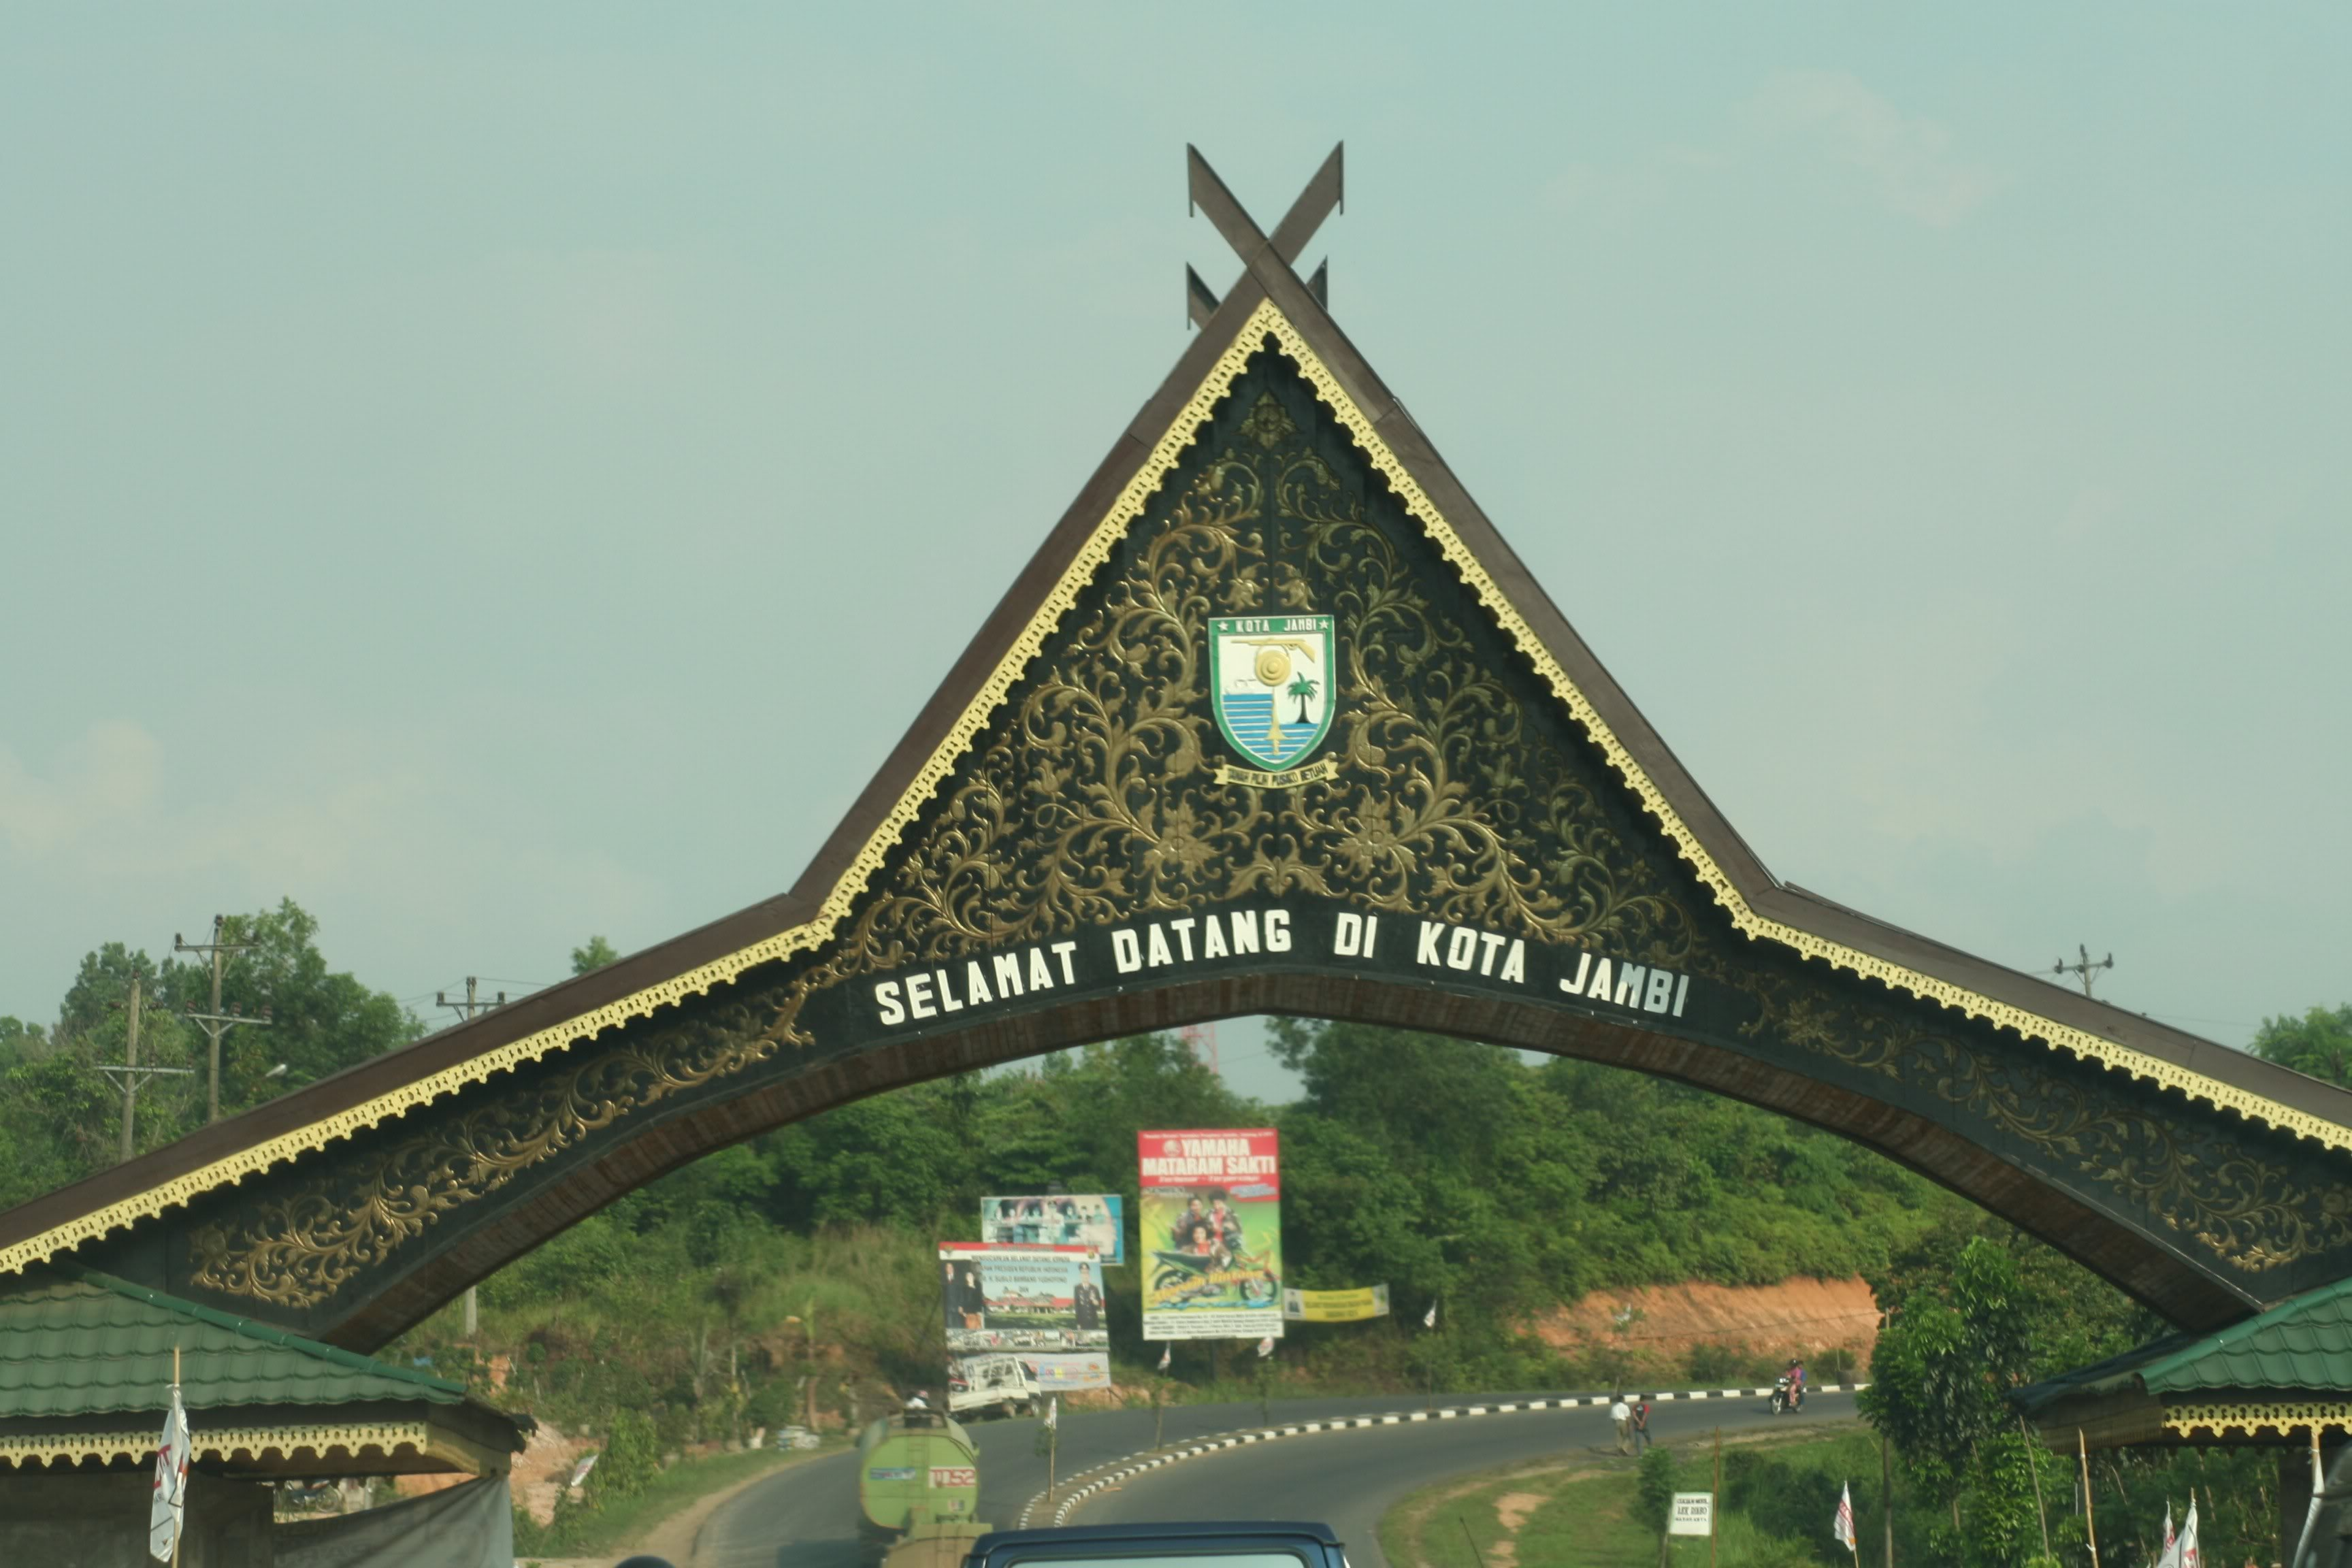 Dudi Gurnadi Catatan Perjalanan Lintas Timur Sumatera Jambi Bali Kota